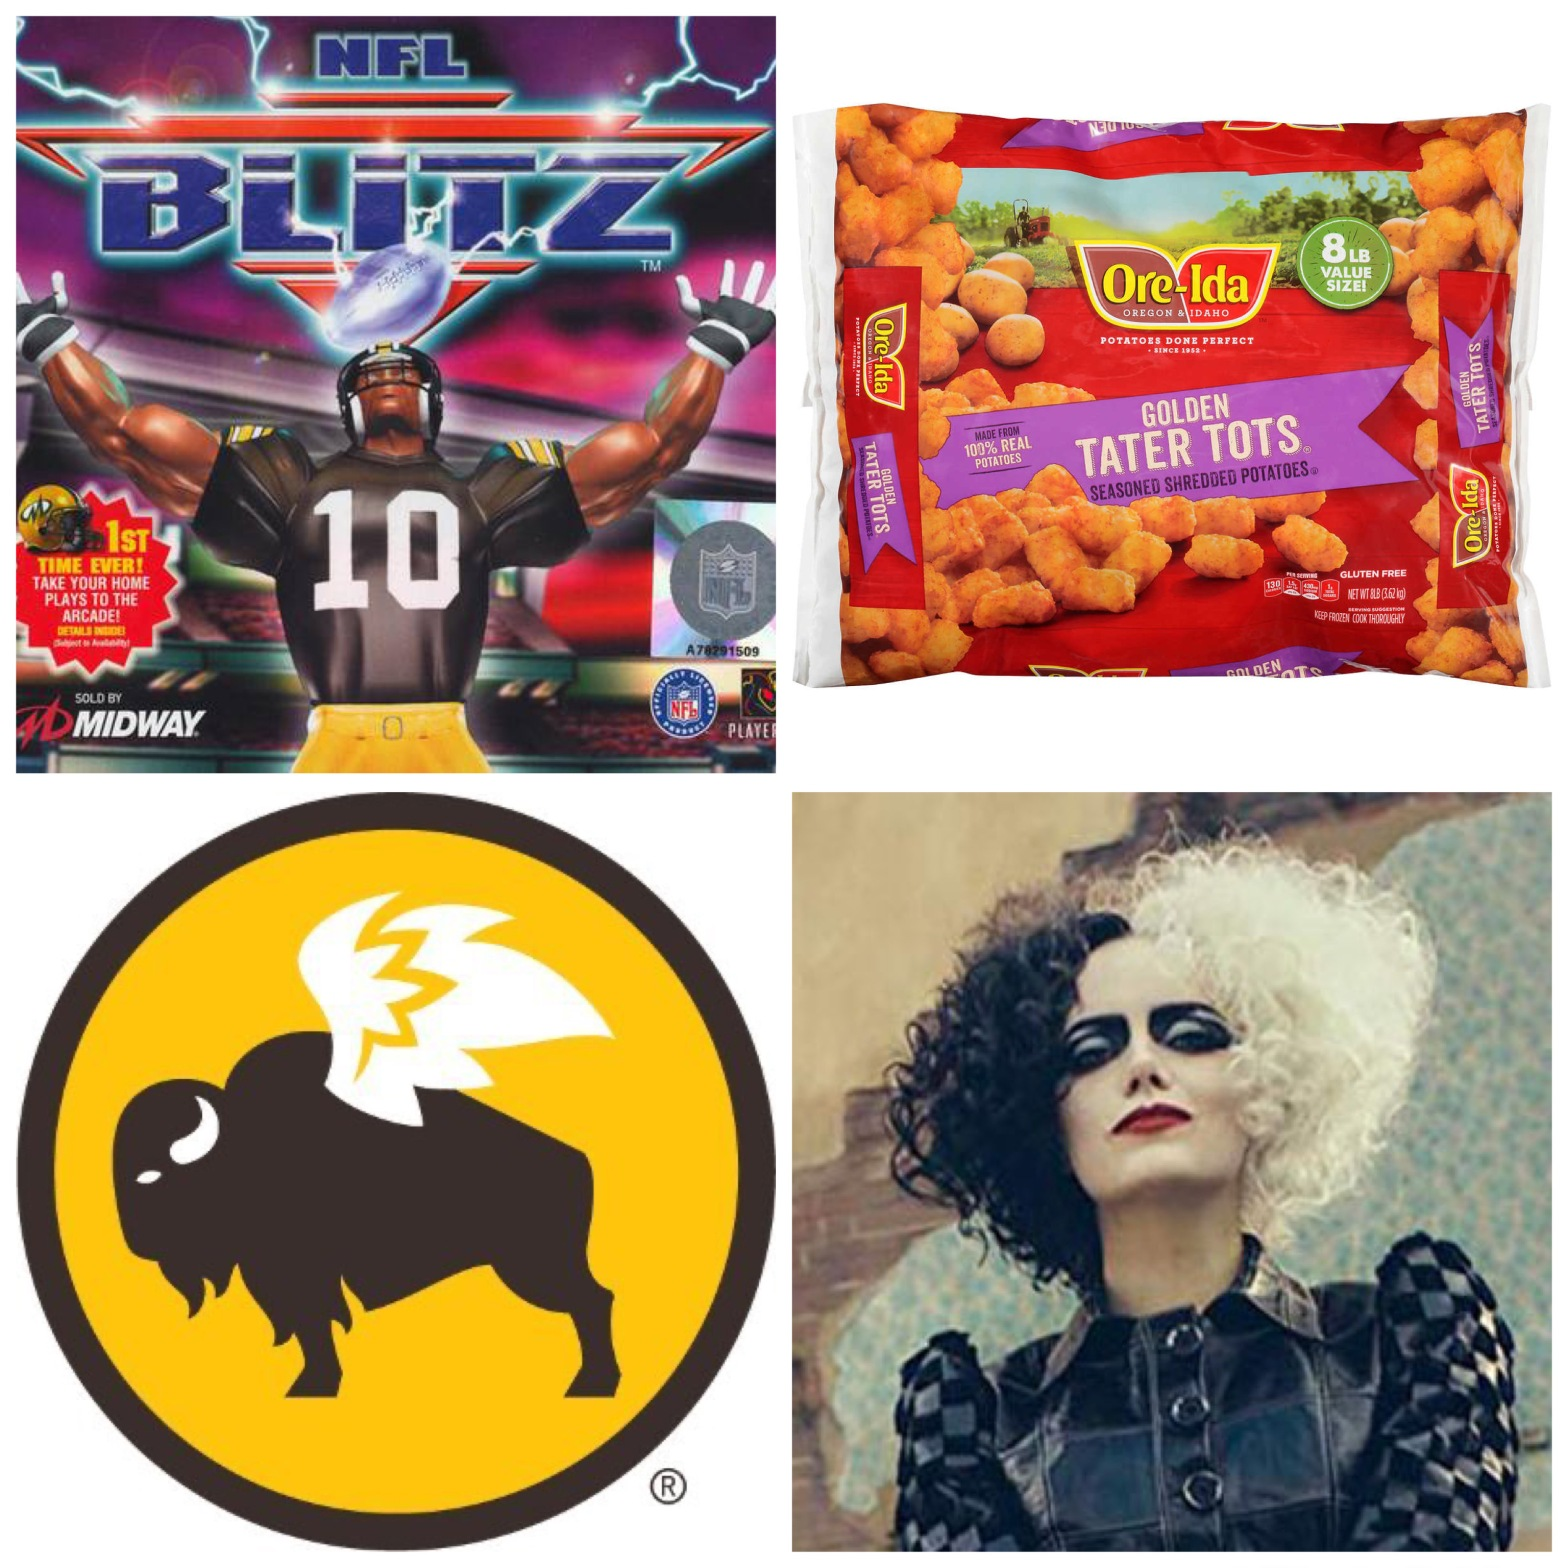 NFL Blitz, frozen tater tots, Buffalo Wild Wings, and Emma Stone's Cruella.